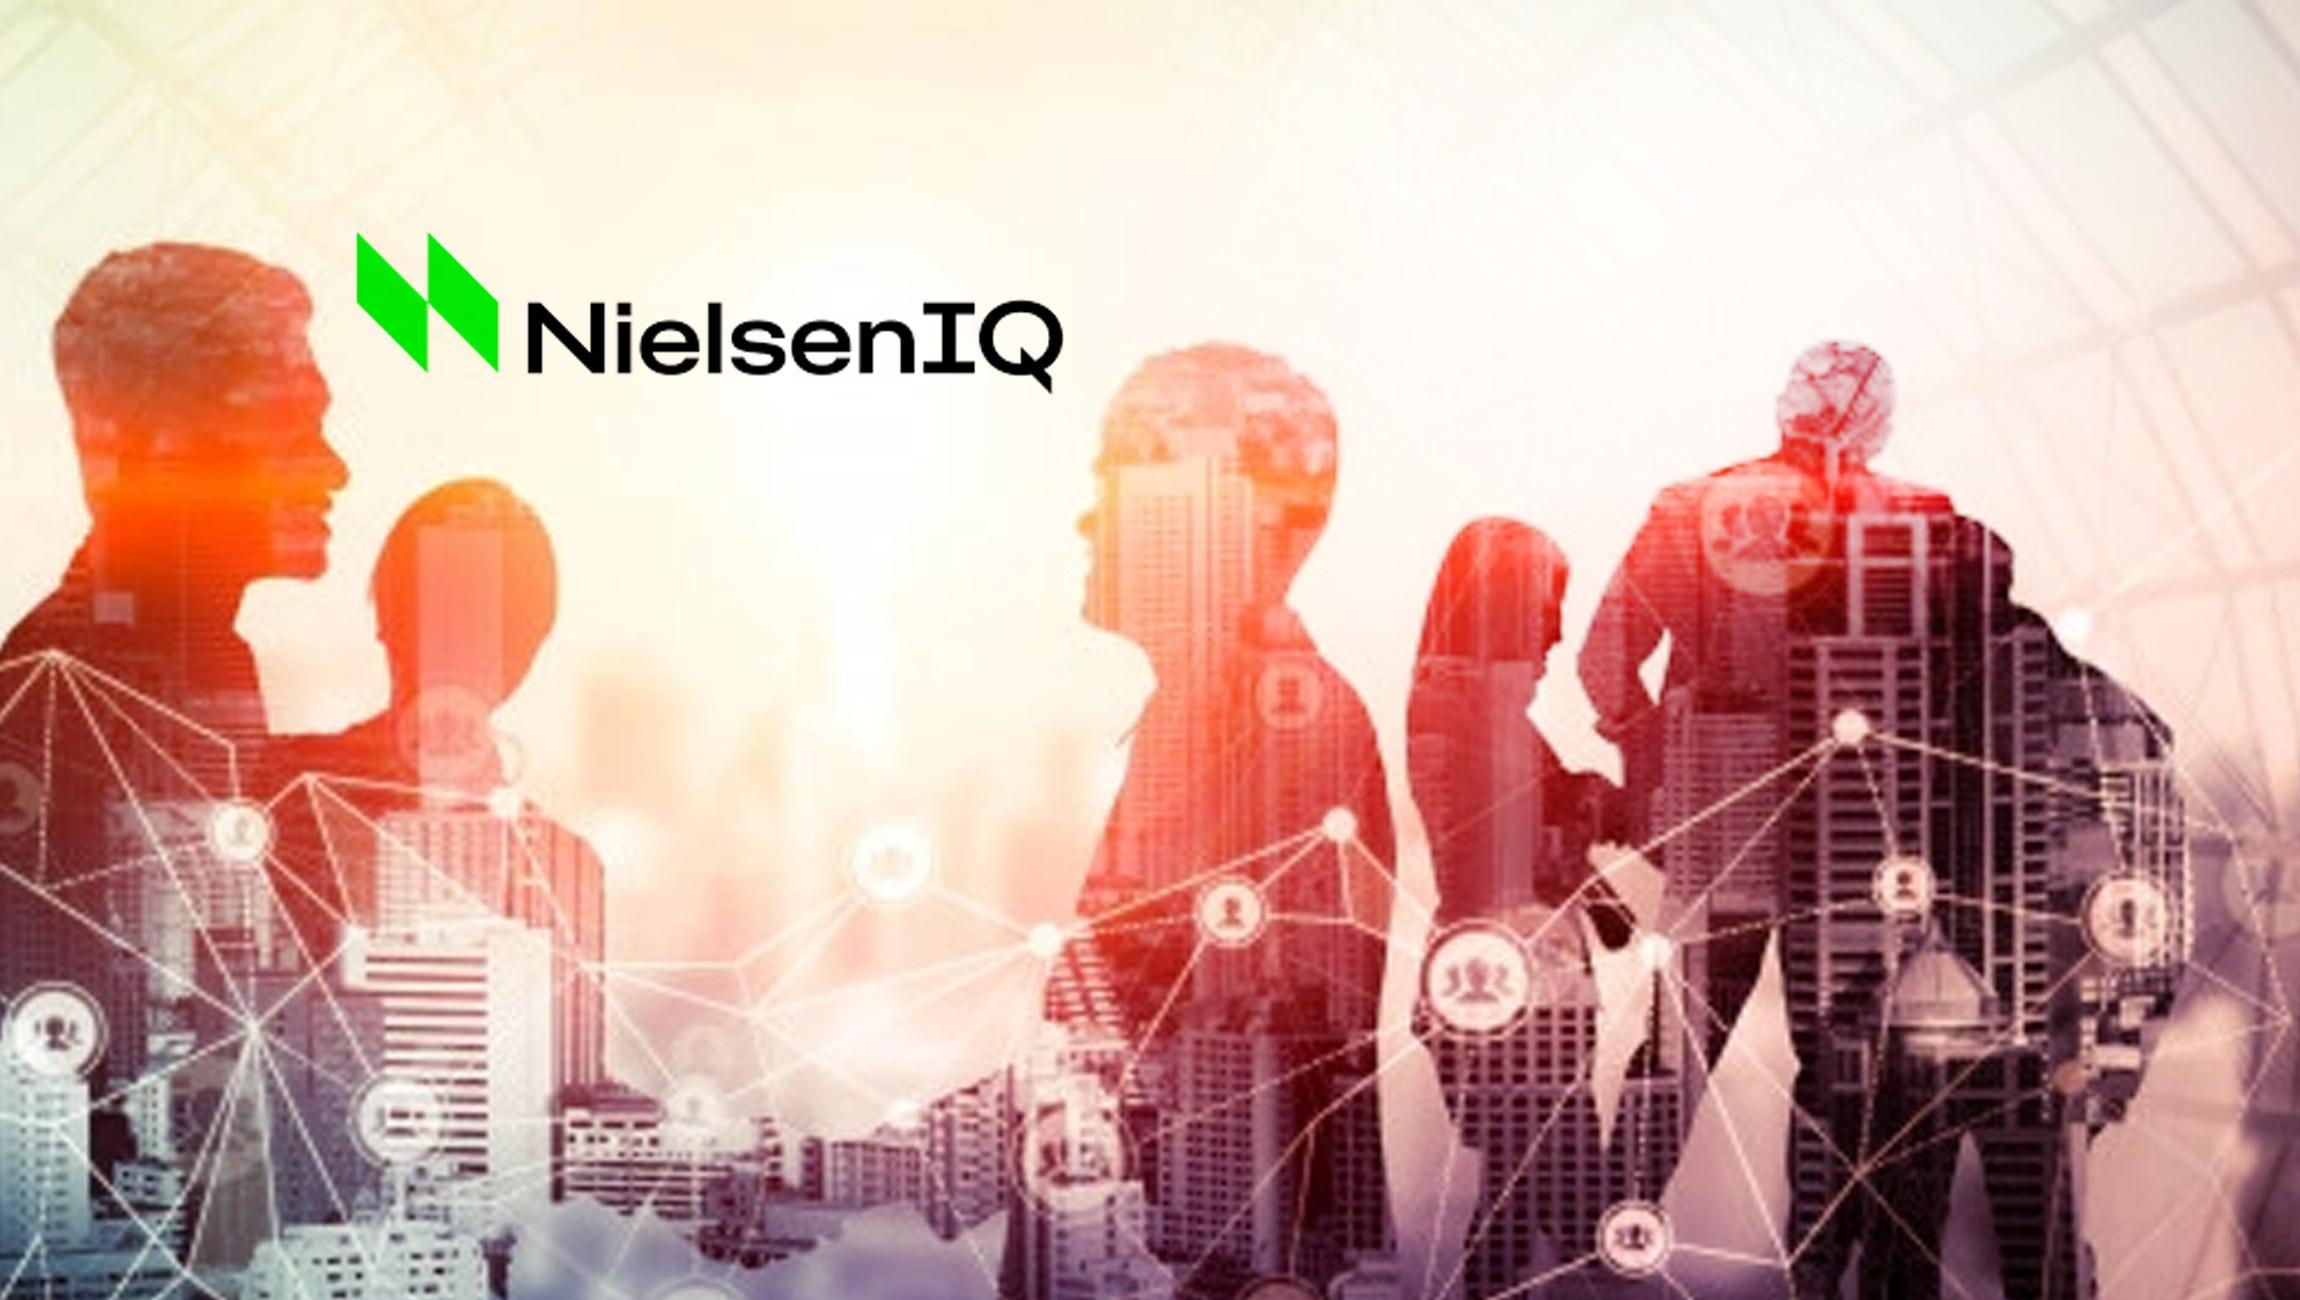 NielsenIQ Acquires Revenue Management Optimization Provider Cornerstone Capabilities